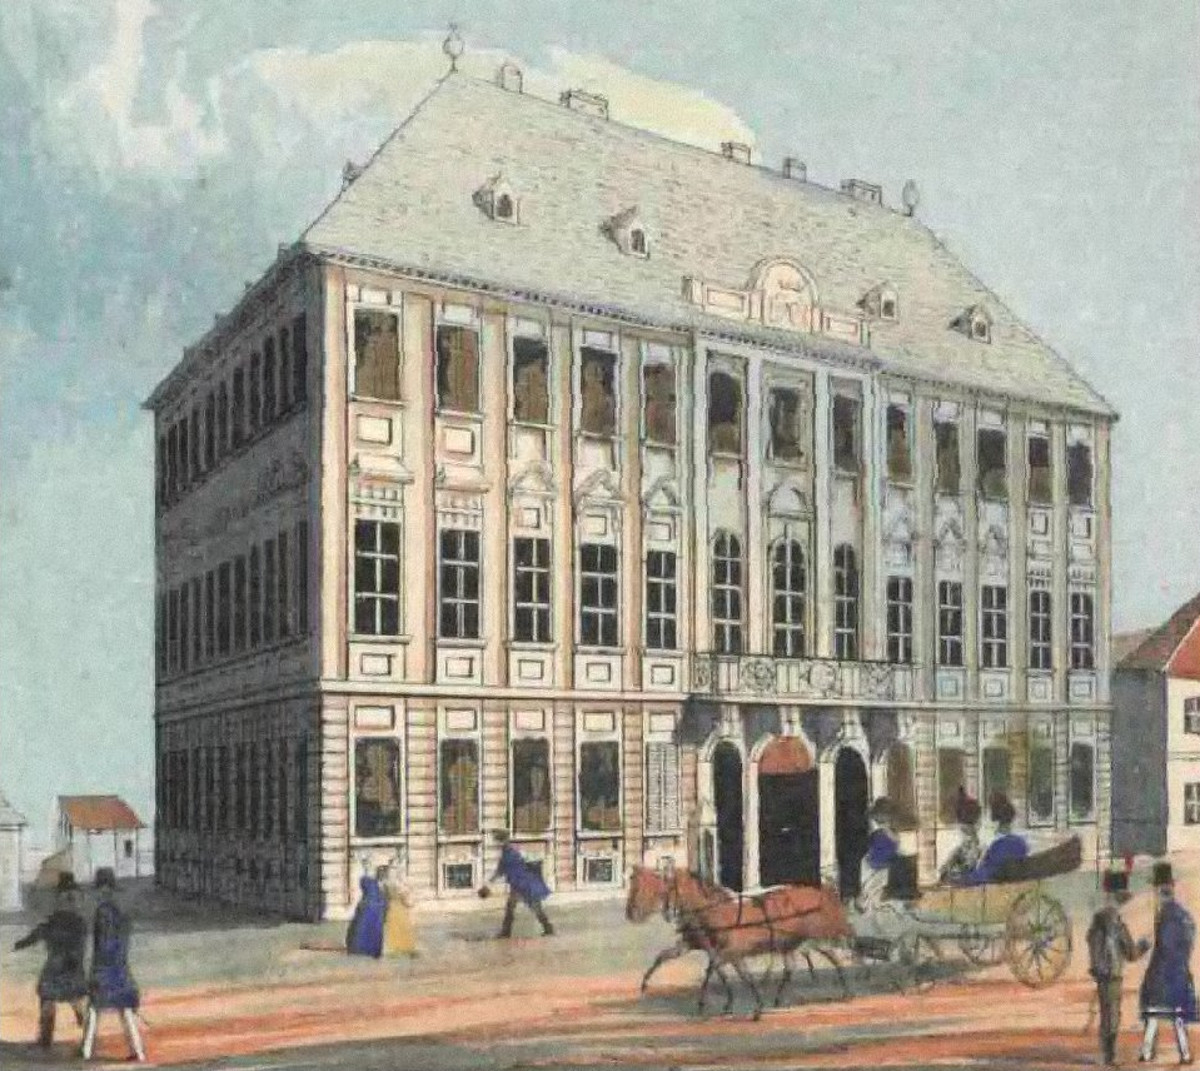 teleki-palota_1837.jpg